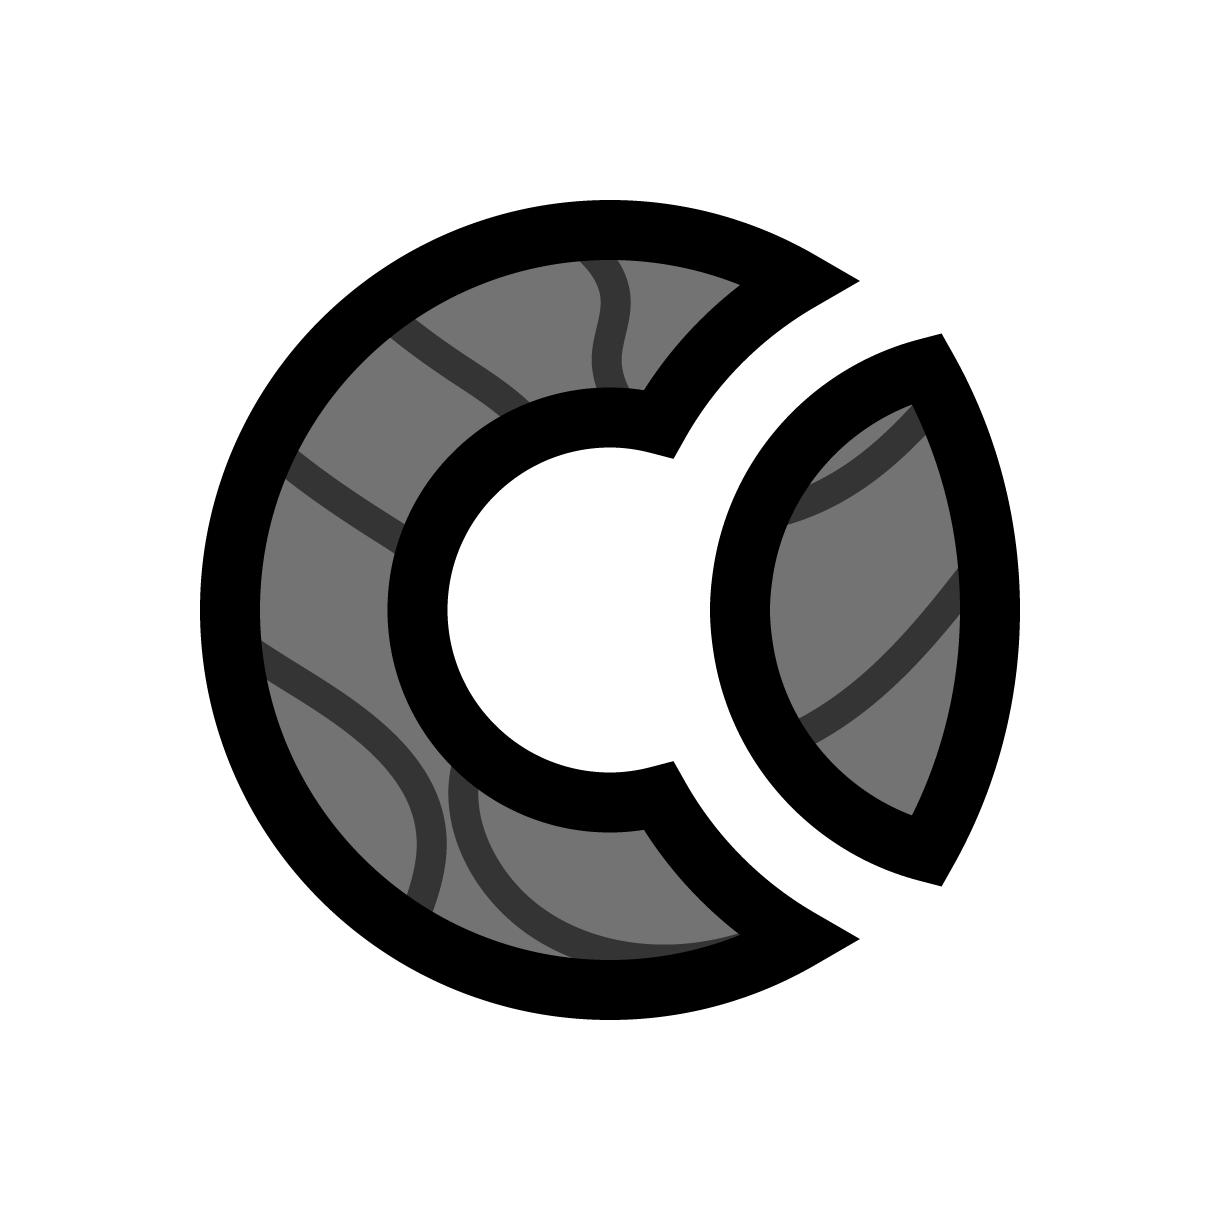 atlas_icon_appcircle-01